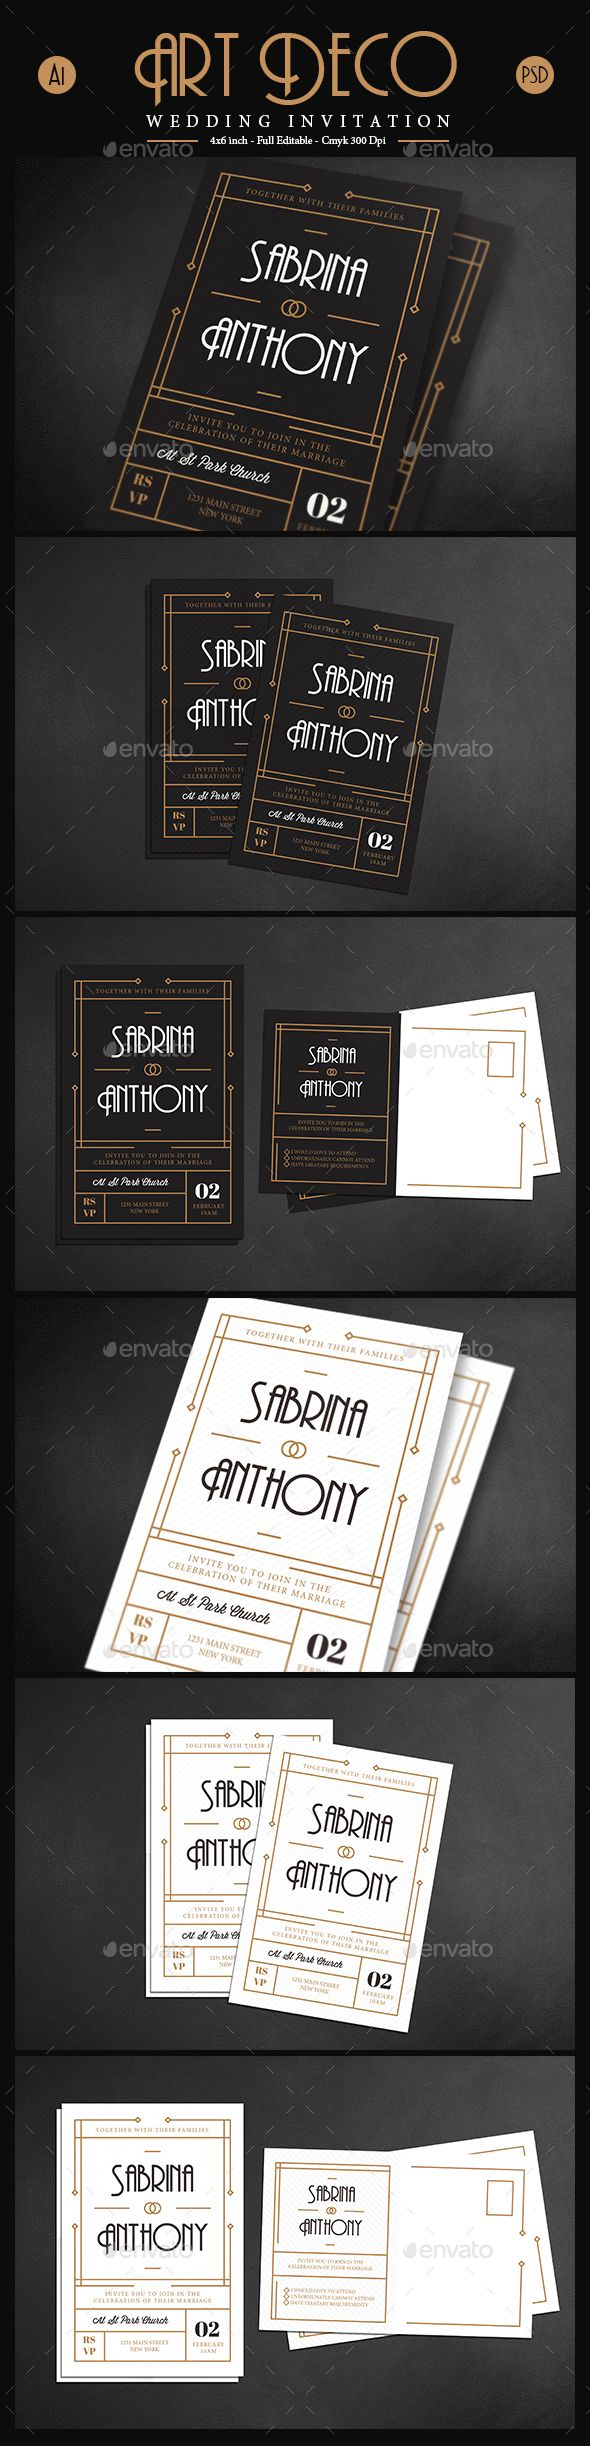 Art Deco Wedding invitation / Card Template PSD, AI Illustrator. Download here: http://graphicriver.net/item/art-deco-wedding-invitationcard-vol-03/15992145?ref=ksioks